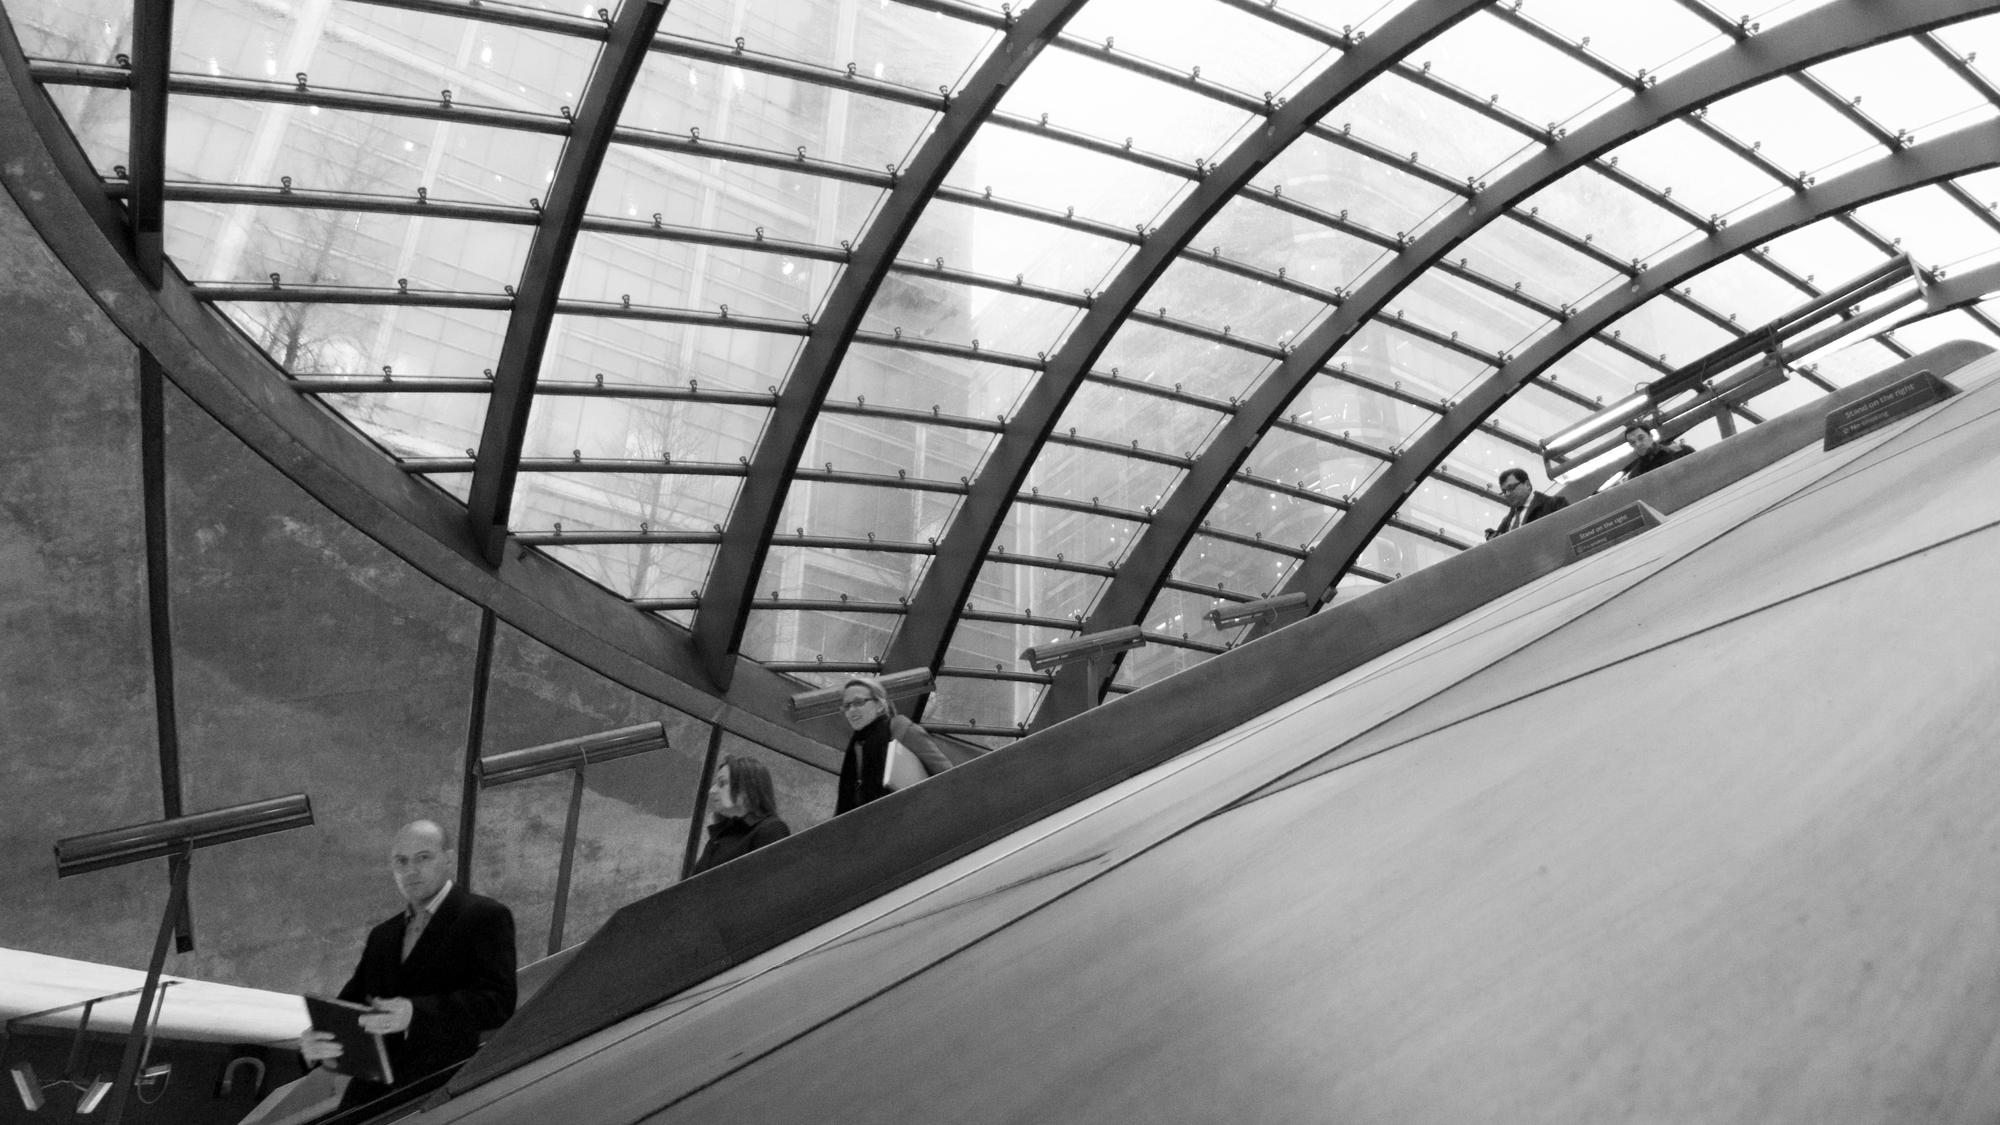 cw_tubestation_escalators2.jpg